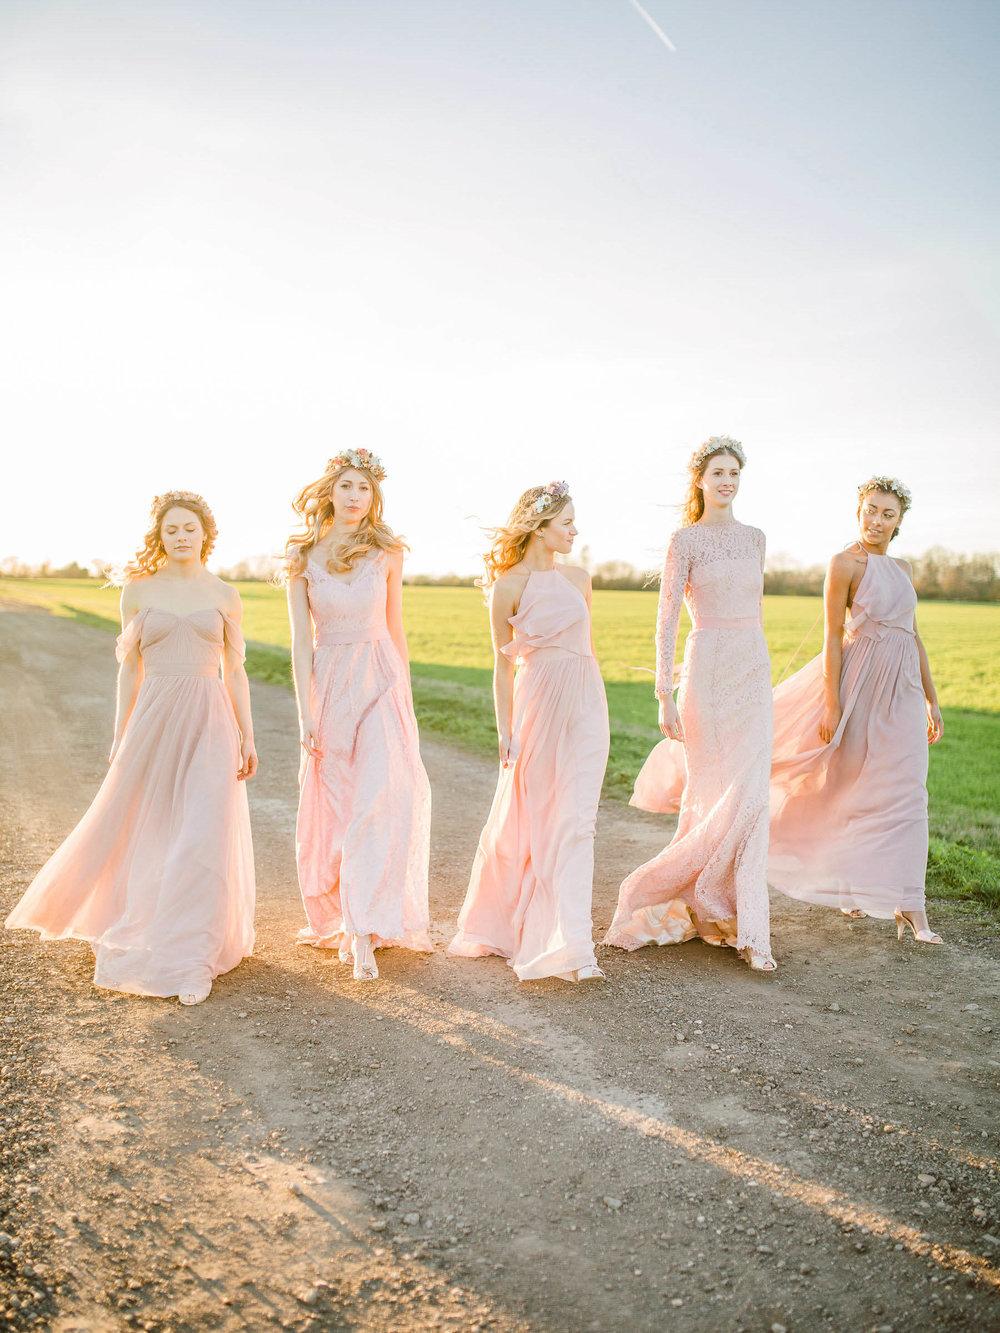 Amy O'Boyle Photography- Destination & UK Fine Art Film Wedding Photographer- TH&TH Bridesmaid Dress Shoot-15.jpg